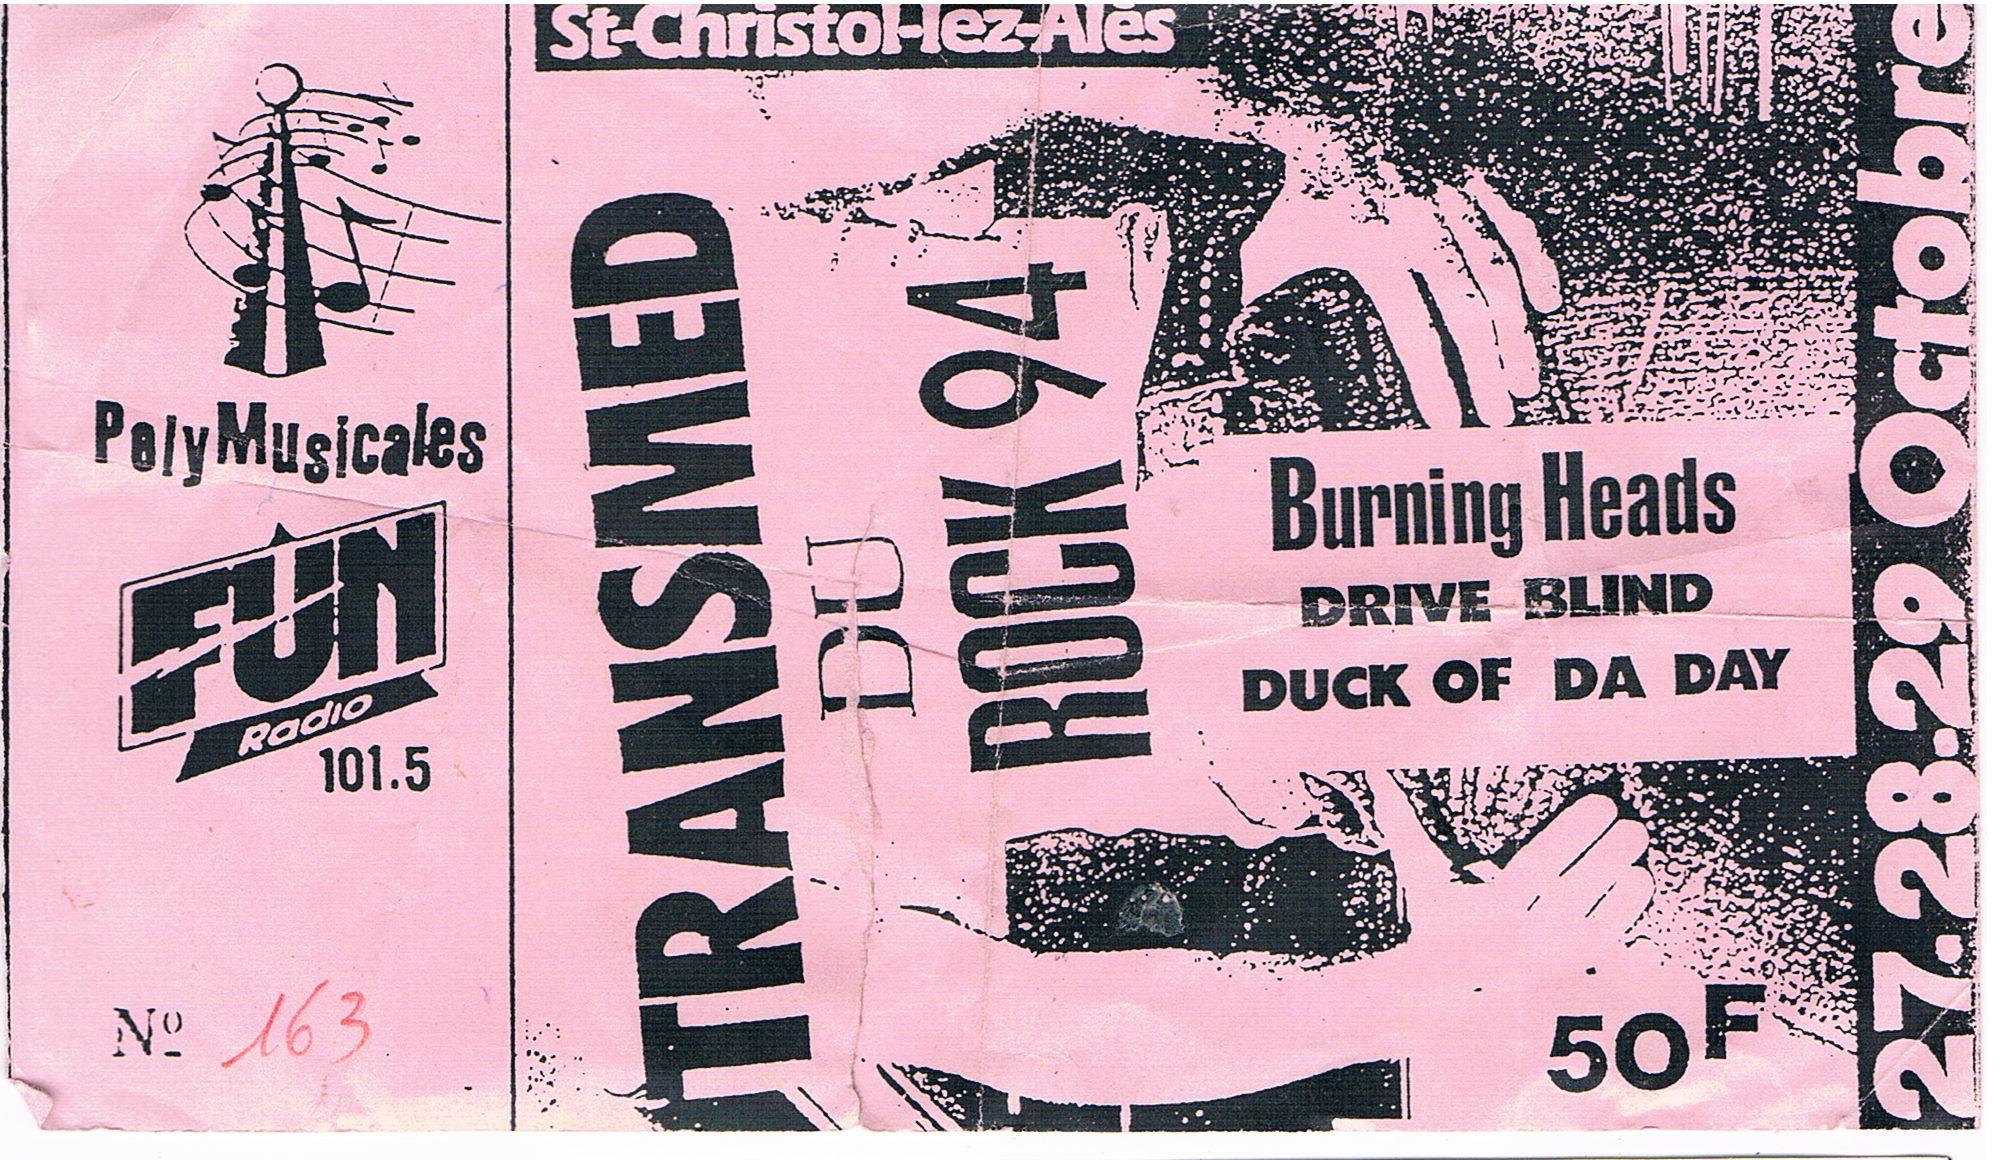 Octobre 1994 Burning Heads, Drive Blind, Duck of Da Day à Saint Christol Lez Ales